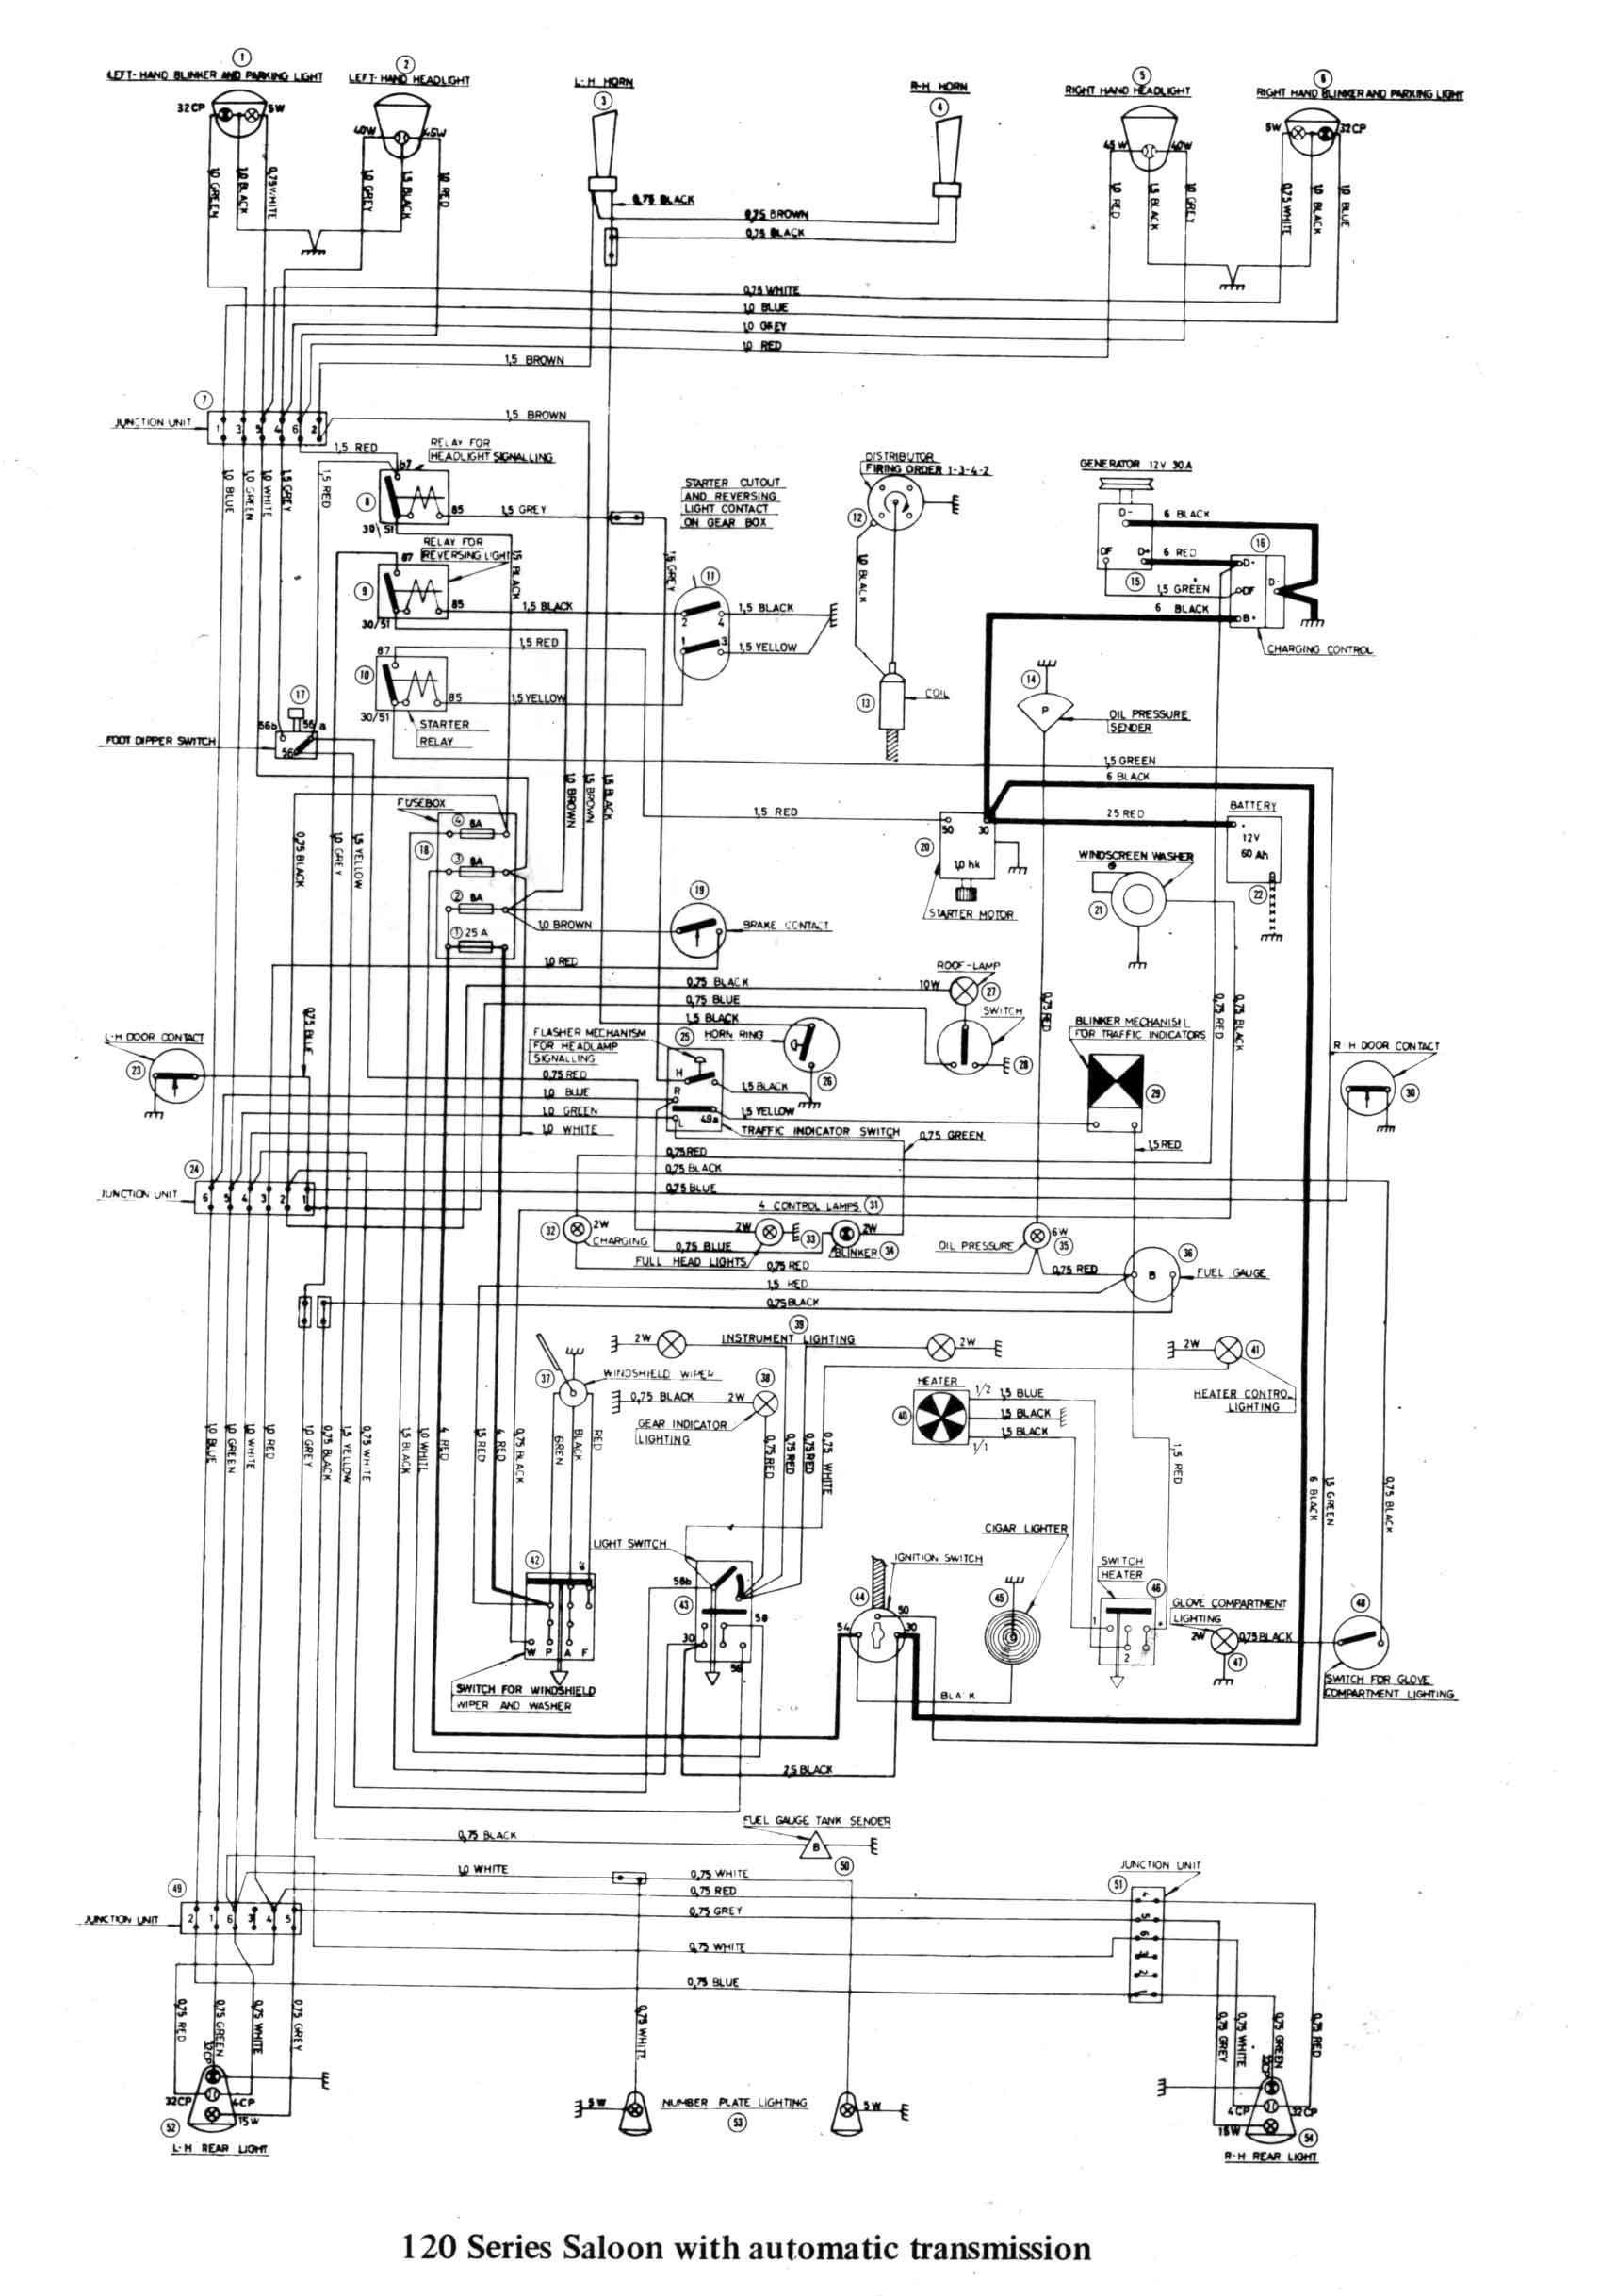 hight resolution of 1975 chevy alternator wiring diagram 350 350 chevy alternator rh banyan palace com 78 chevy alternator